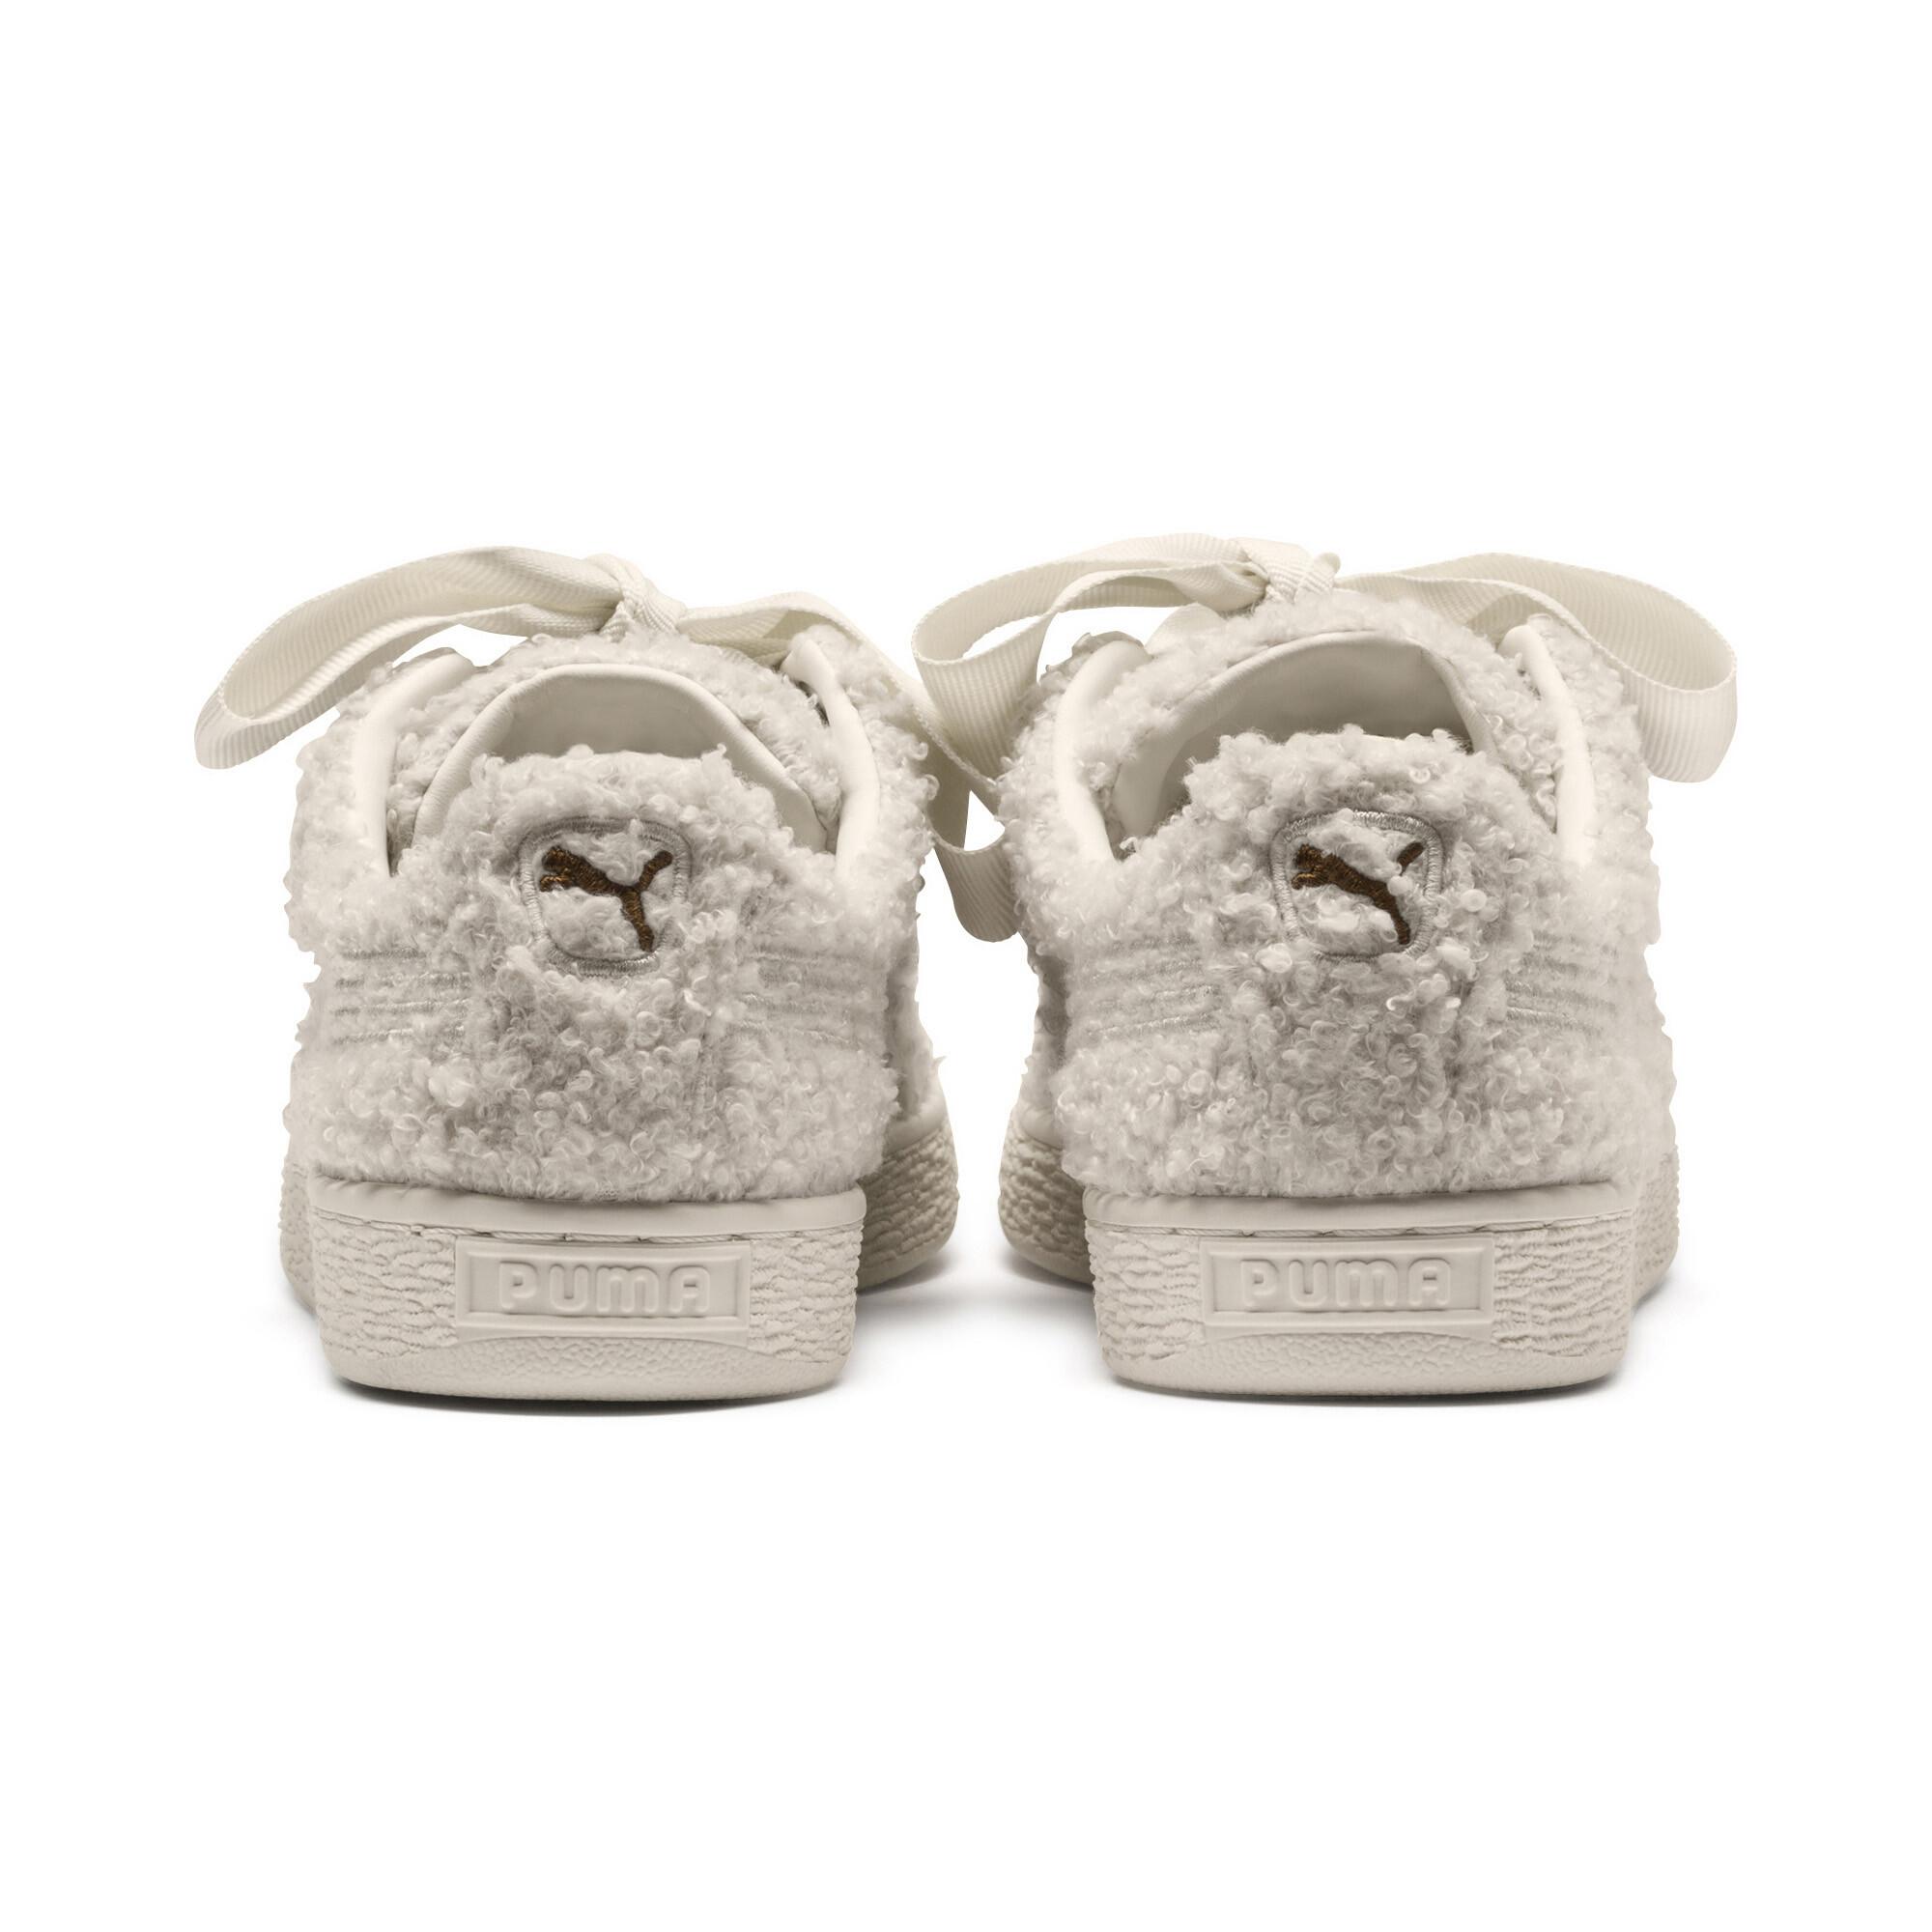 the latest 994c9 8c9f1 Details about PUMA Basket Heart Teddy Women's Sneakers Women Shoe